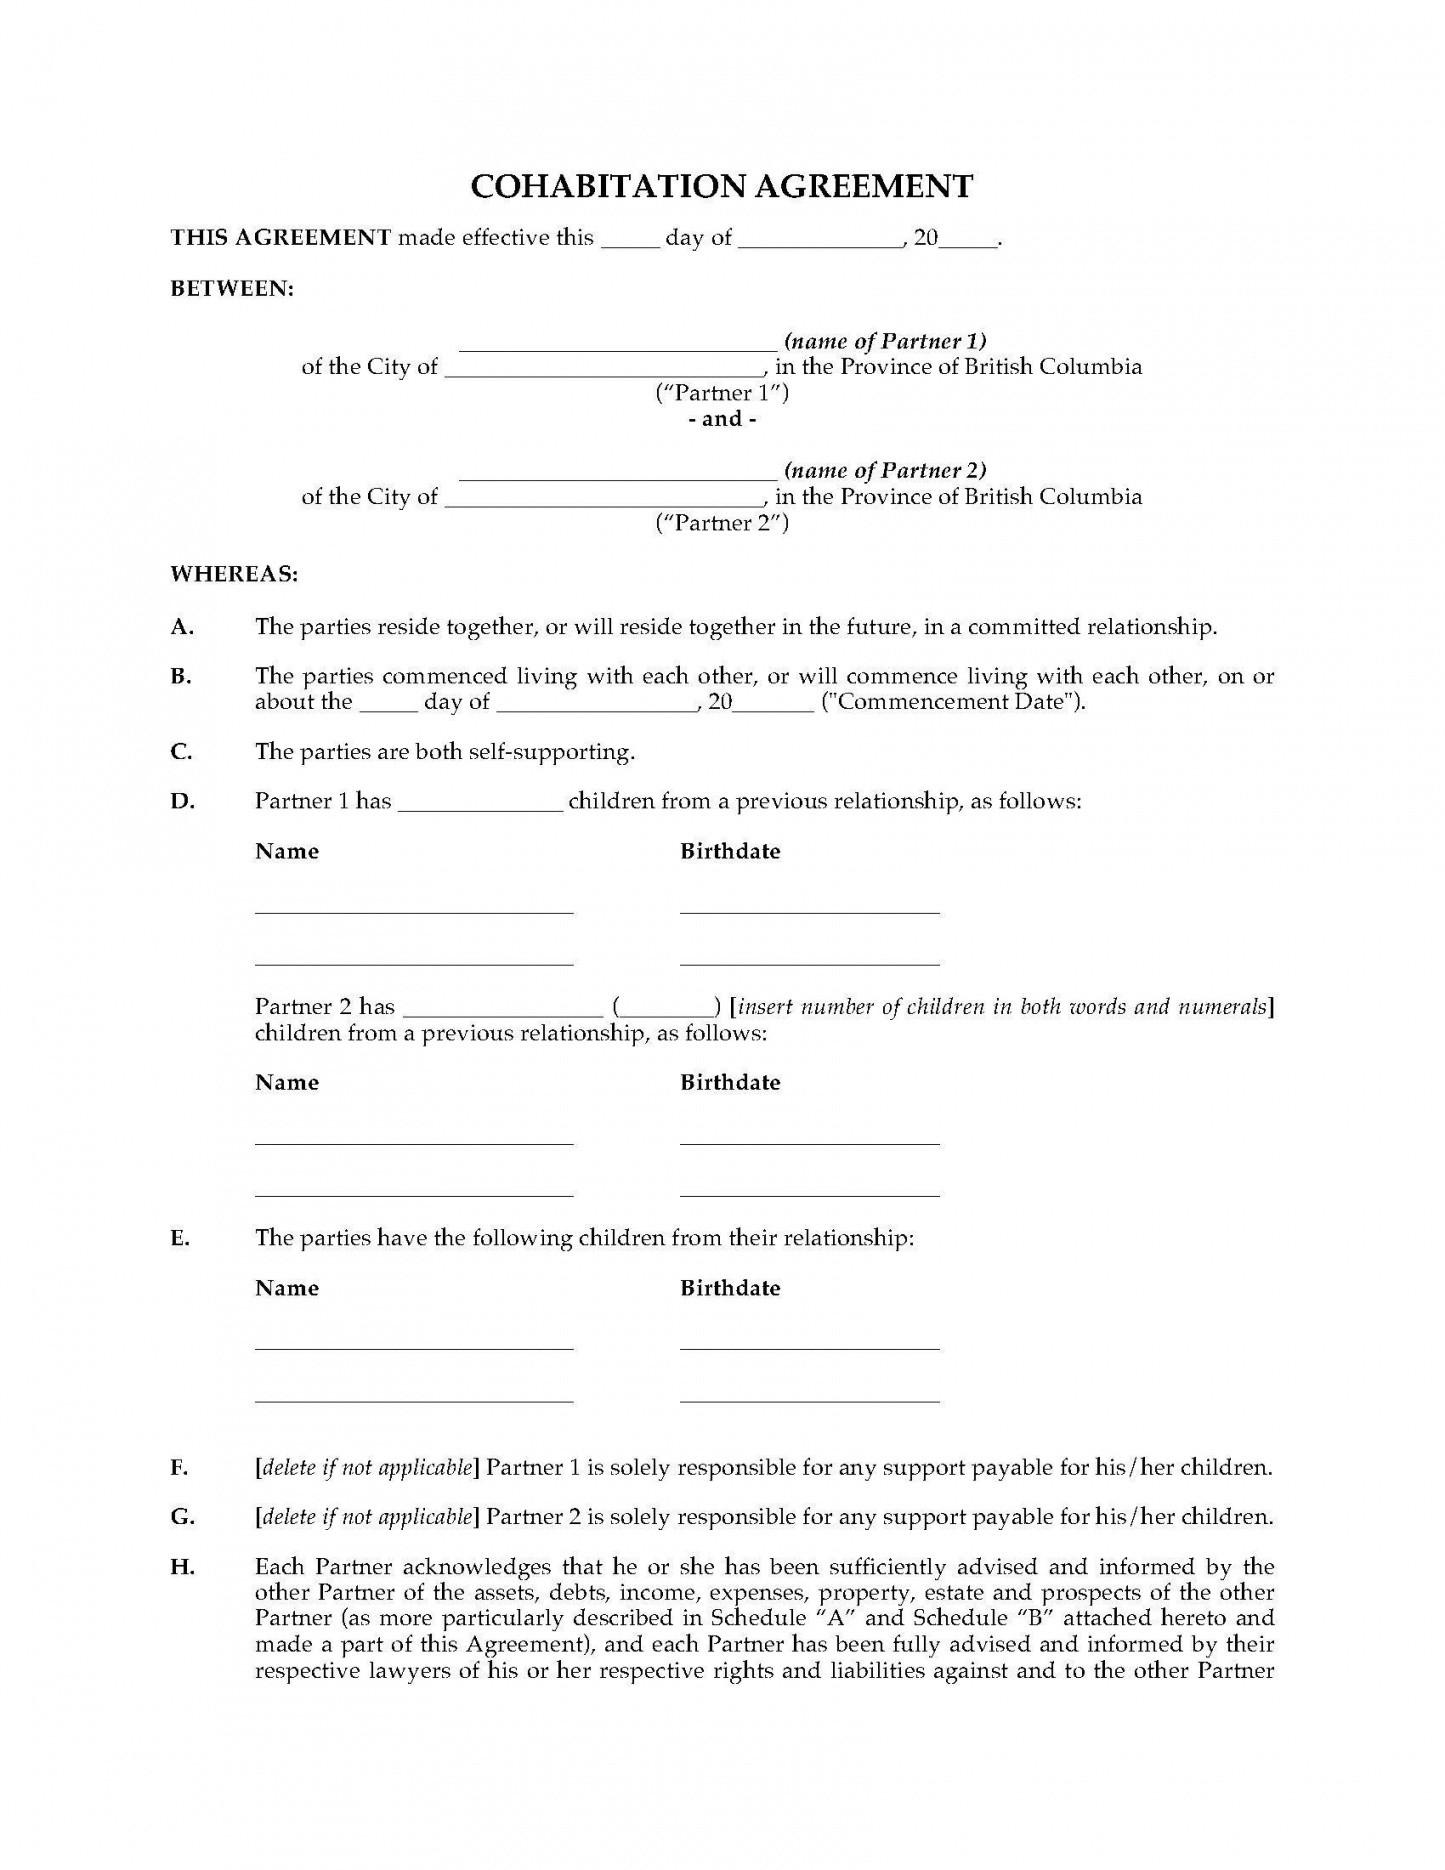 Free Printable Prenuptial Agreement Form Cohabitation Agreement Template Free Template Design Ideas